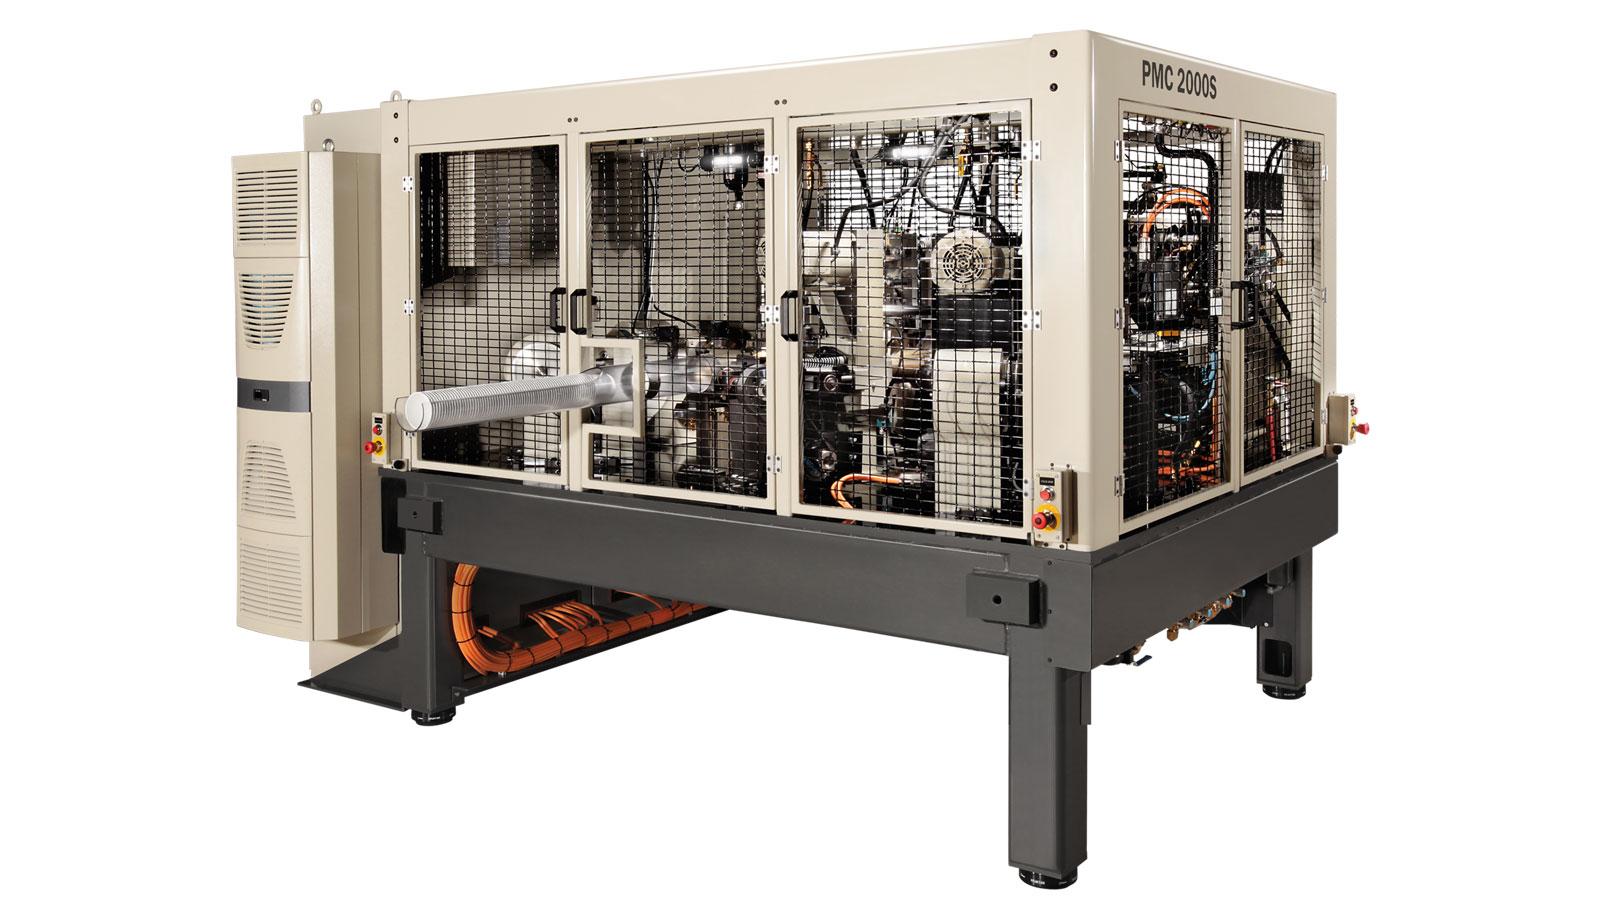 PMC 2000S Servo Driven Forming Machine   Paper Machinery